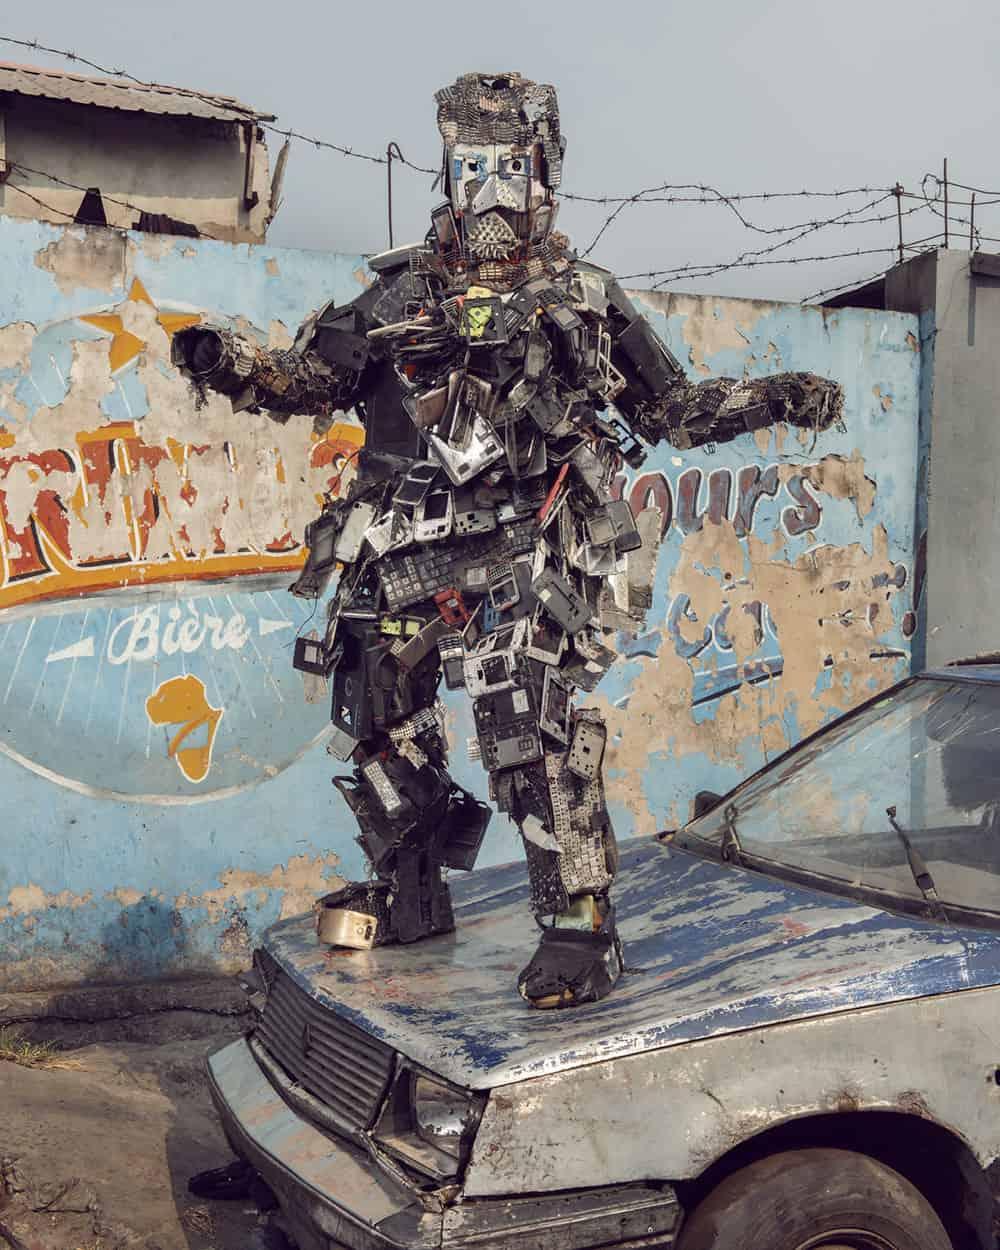 Untitled #19, 2020 Homo Detritus, Real Portraitik #5 Kinshasa, RDC ©Stephan Gladieu